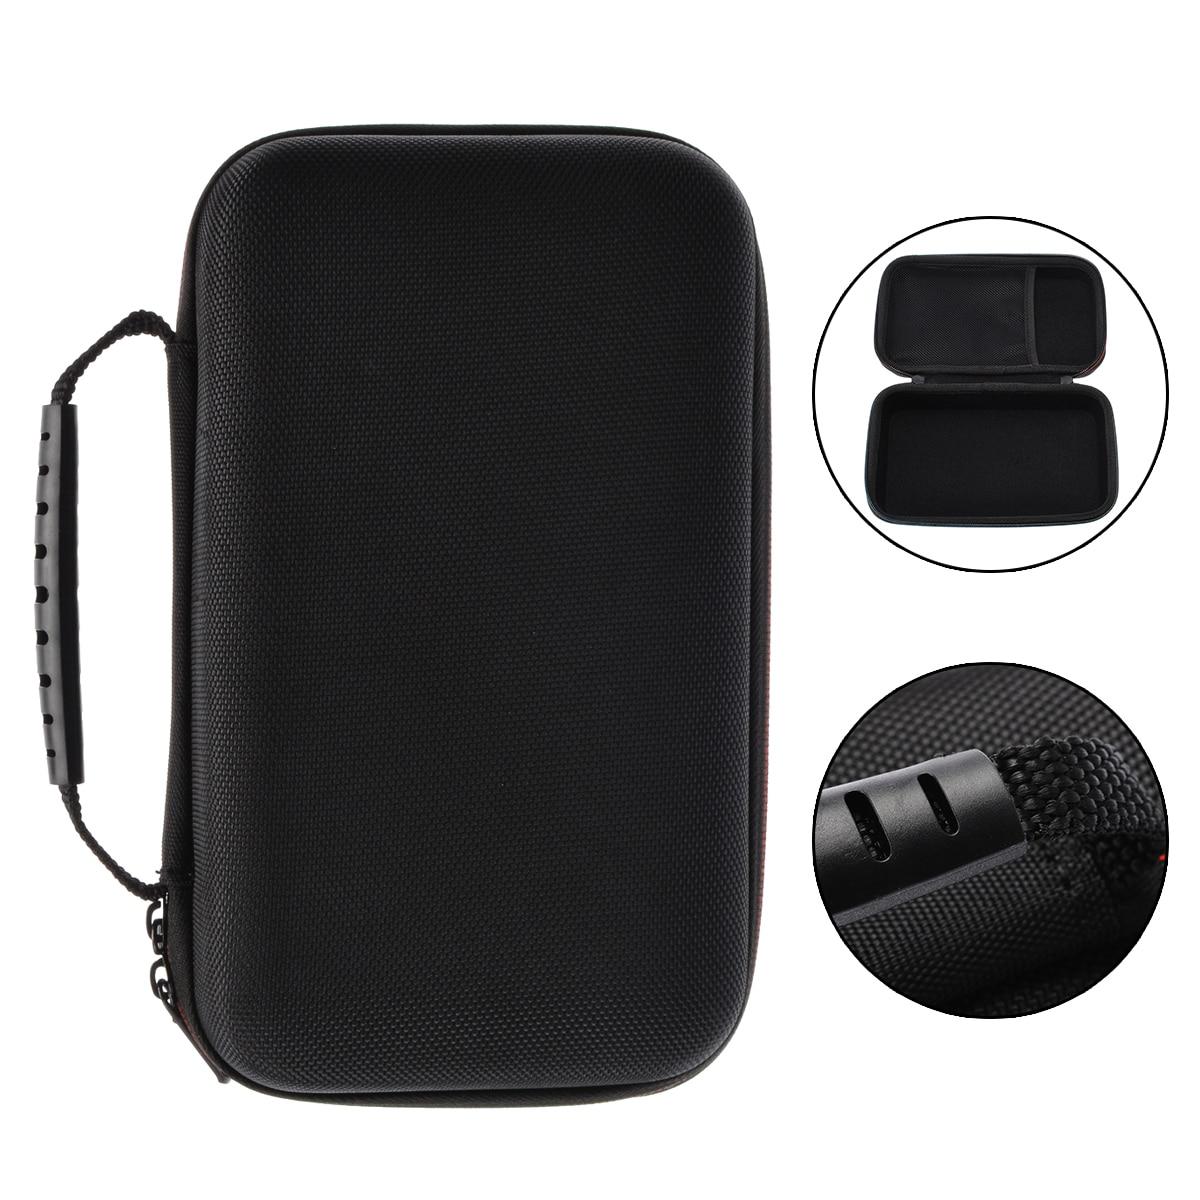 Portable EVA Tester Multimeters Storage Bag Carry Too Bag Case For F117C/ F17B Digital Multimeter